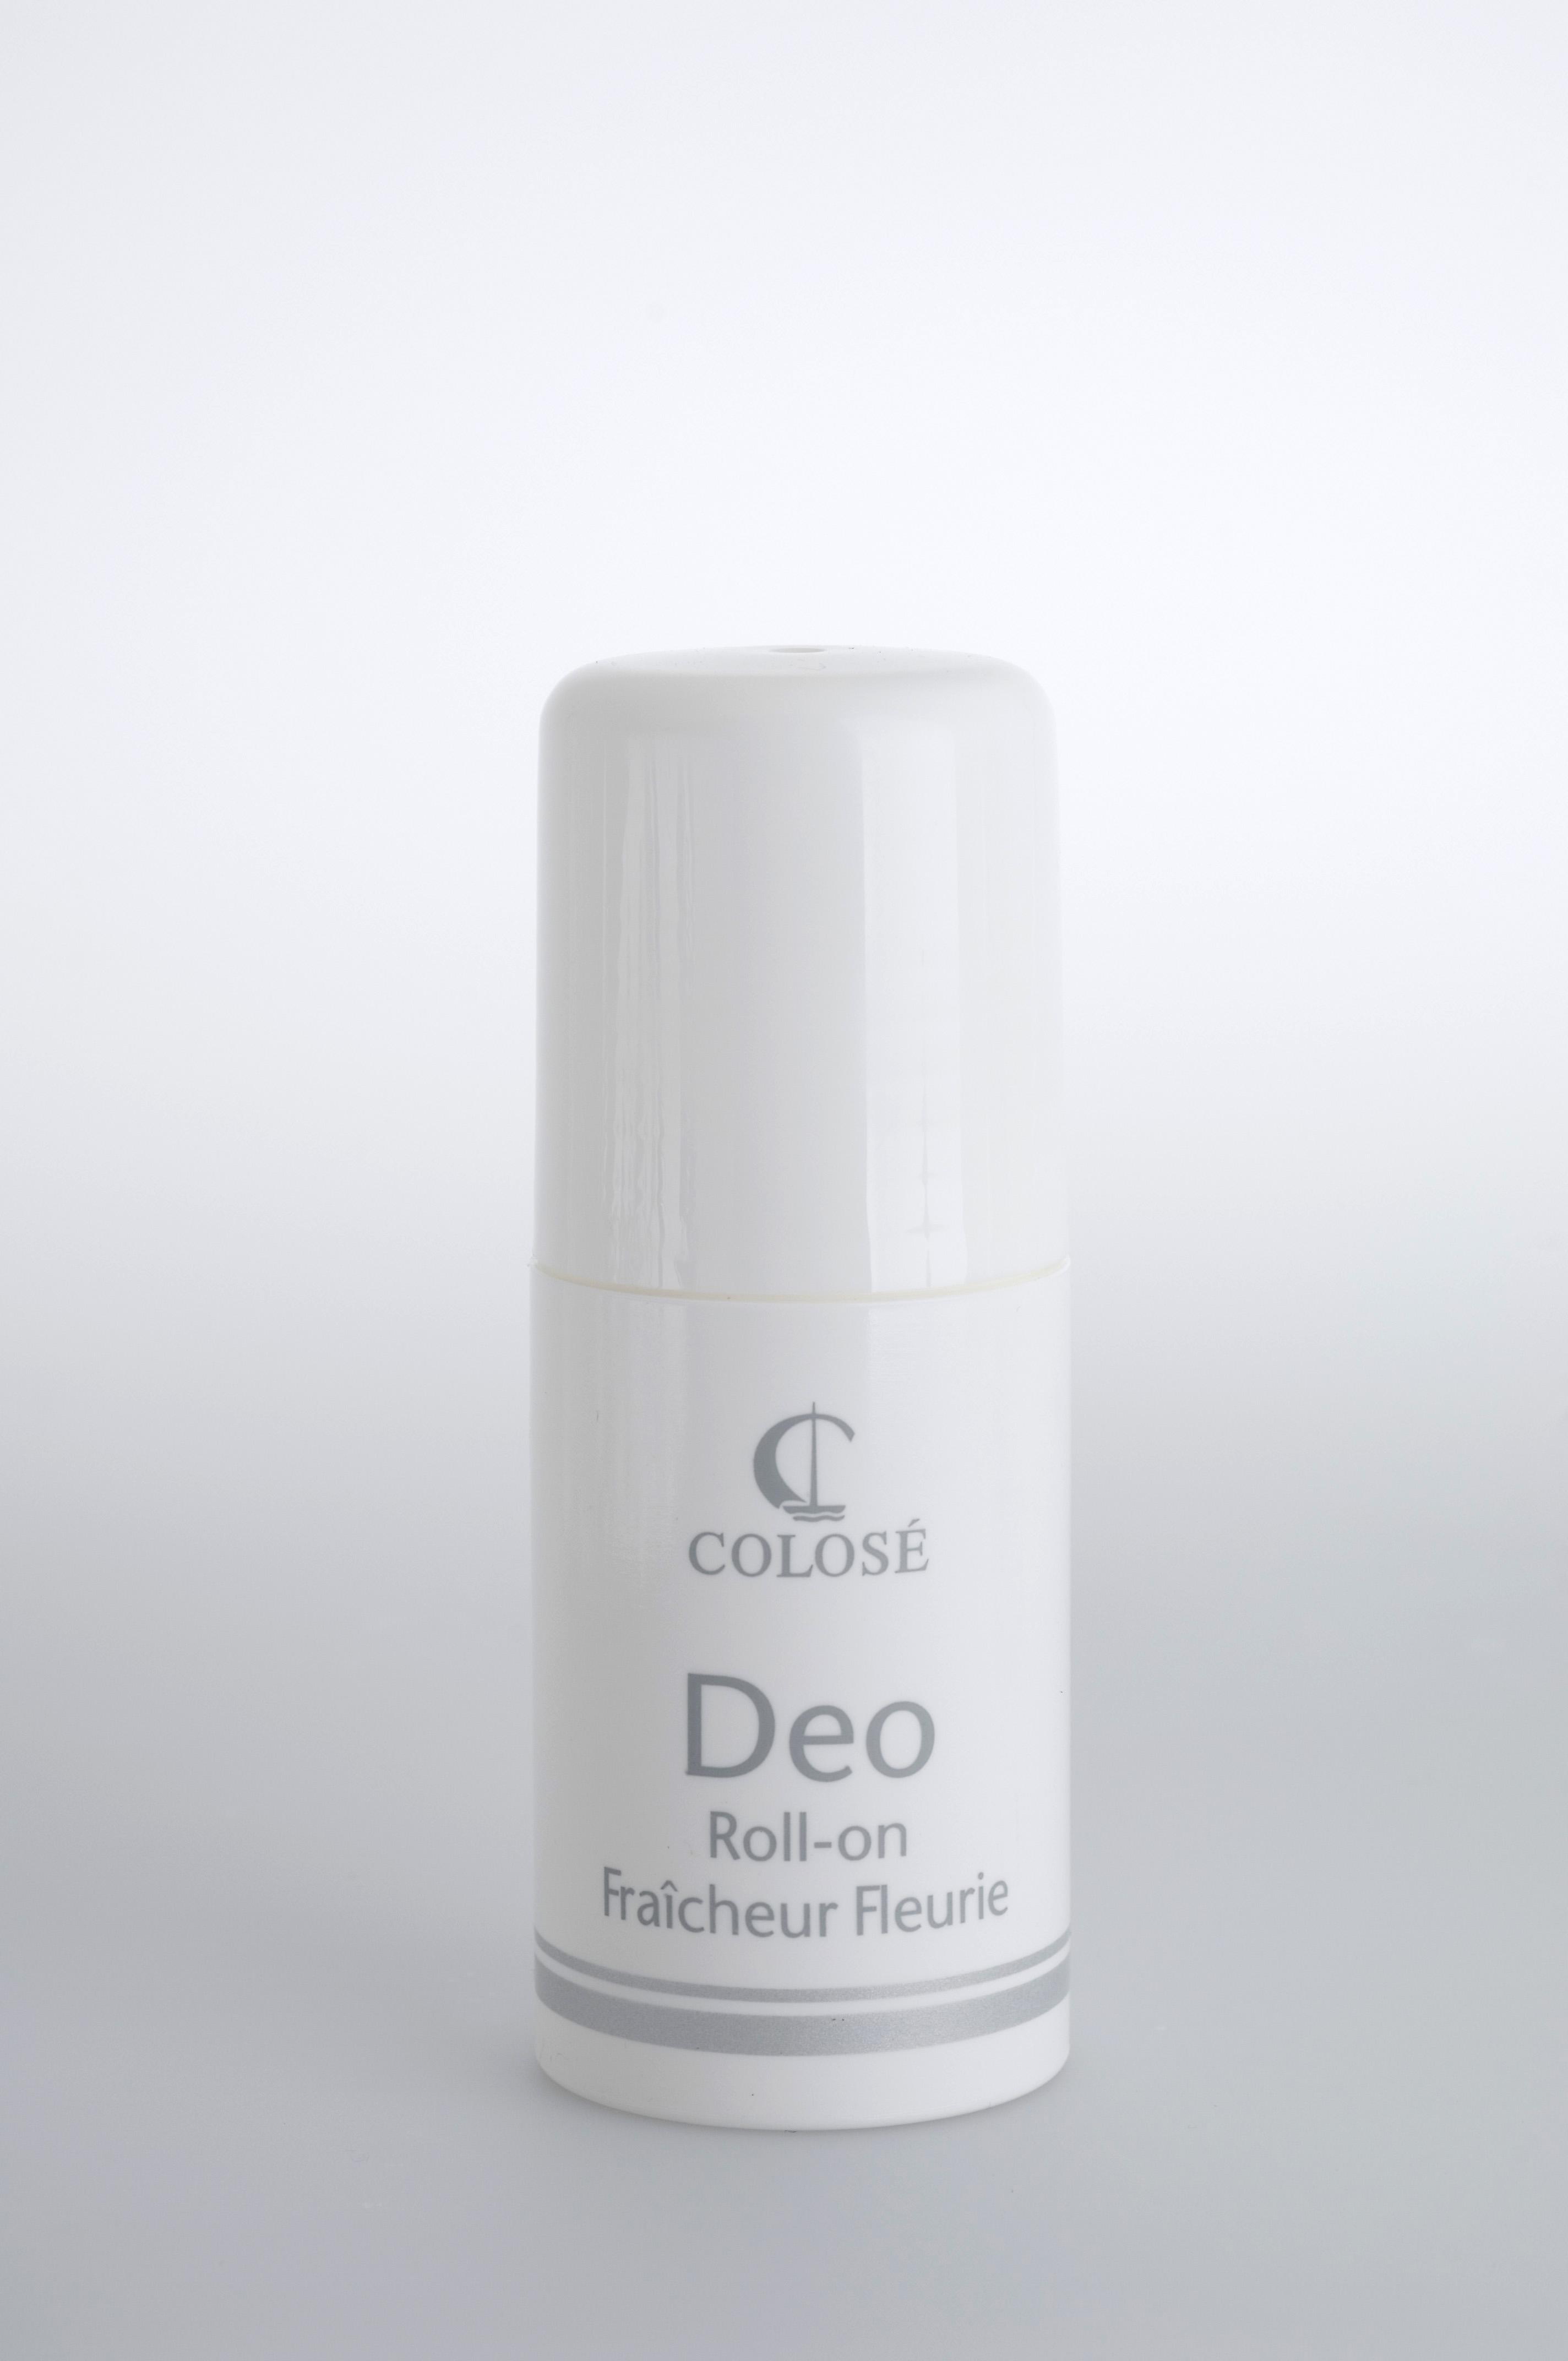 DRoll on deodoran til kvinder, mild og beskyttende, med antipersperant